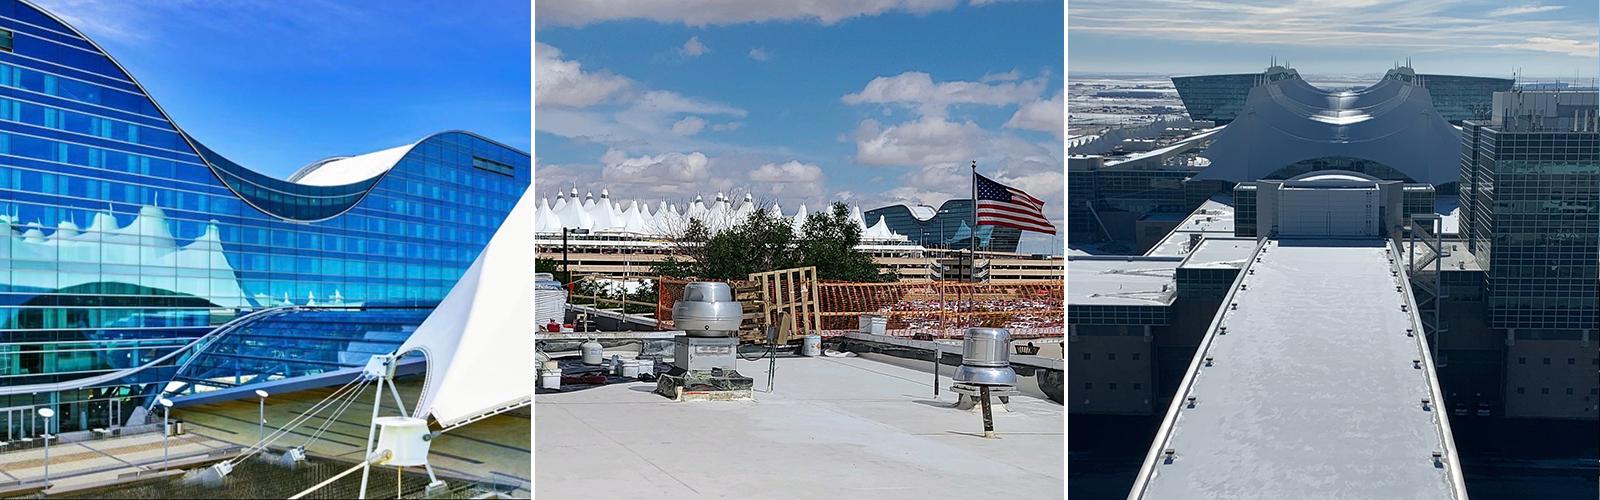 denver airport roof installation